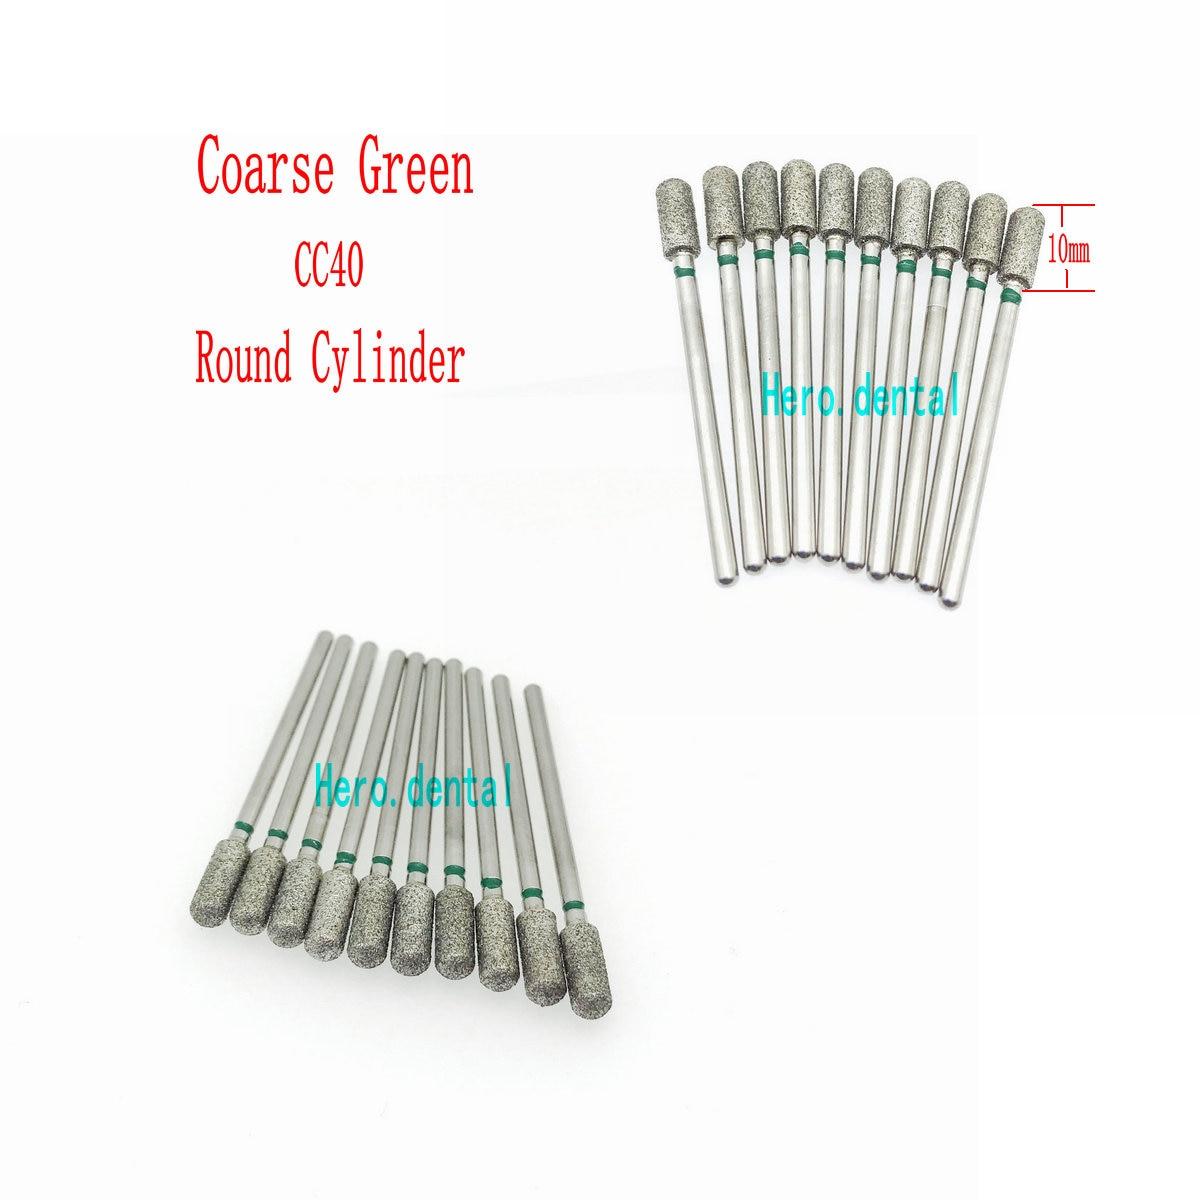 10pcs Coarse Green 2.35mm Dental Shank Diamond Grinding Bur Drill For Dental Grinding Dental Polishing Burs